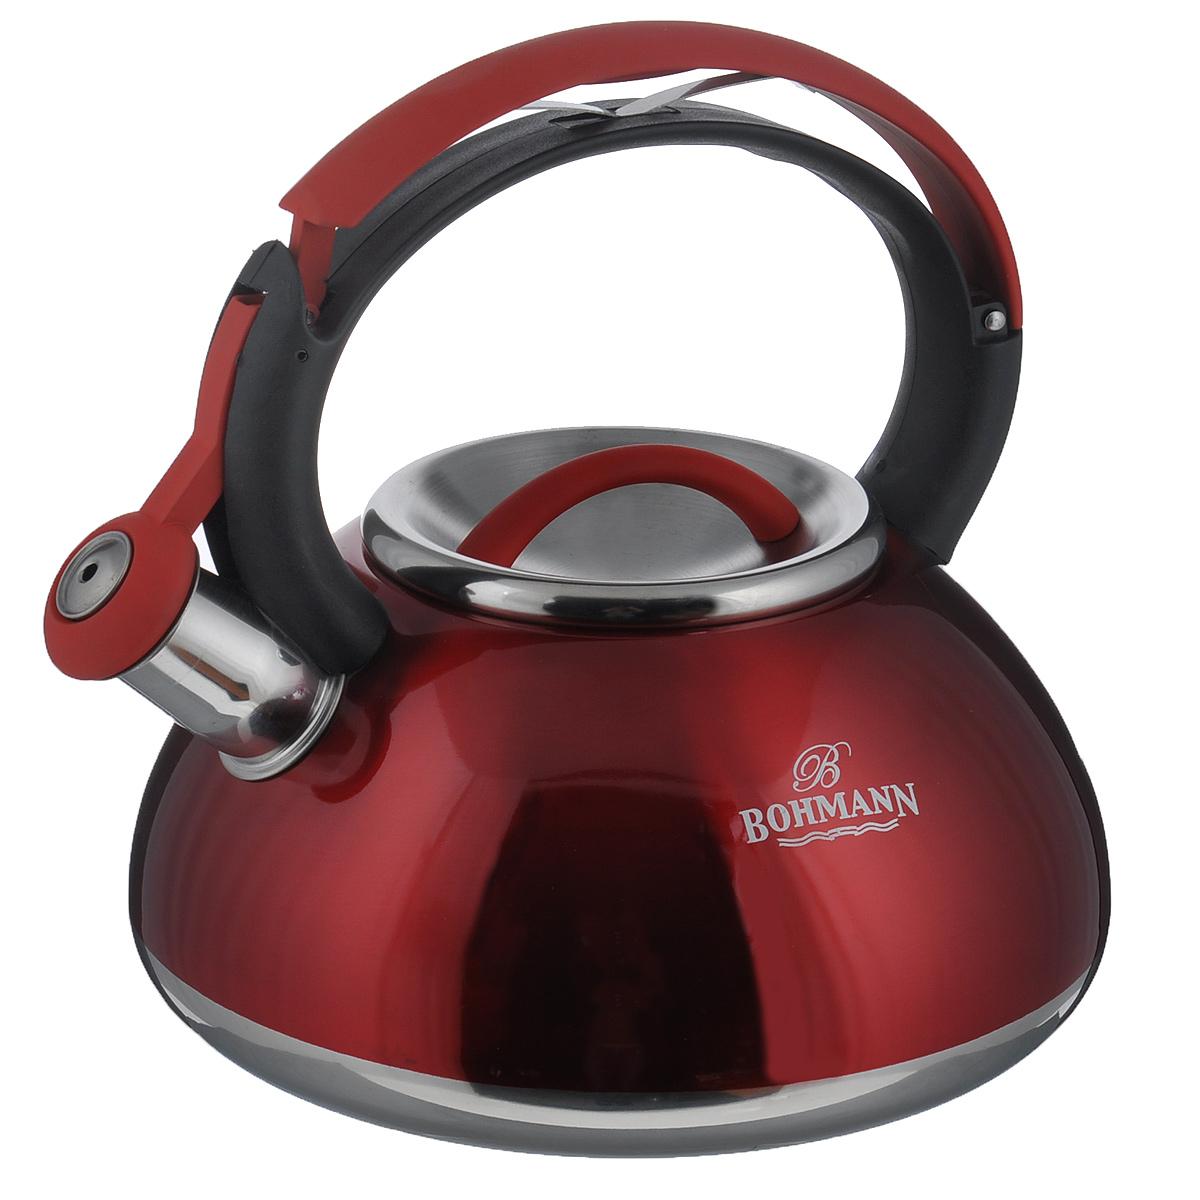 Чайник Bohmann со свистком, цвет: красный, 3 л. BH - 9939